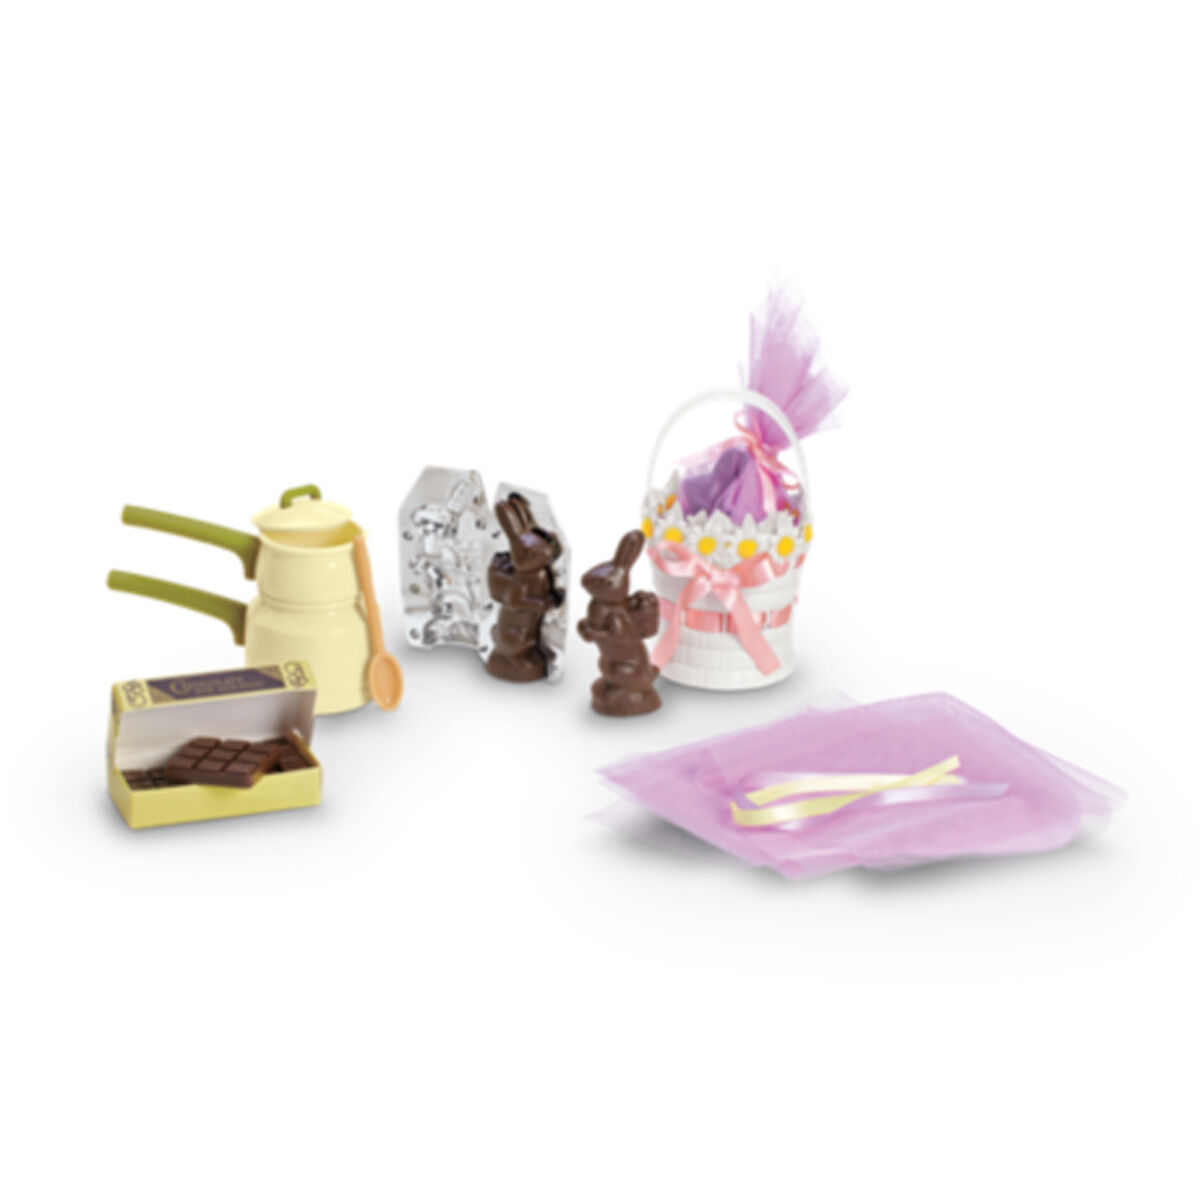 American Girl SETS Homemade Bonbons für 45.7cm Puppen Set Häschen Schokolade